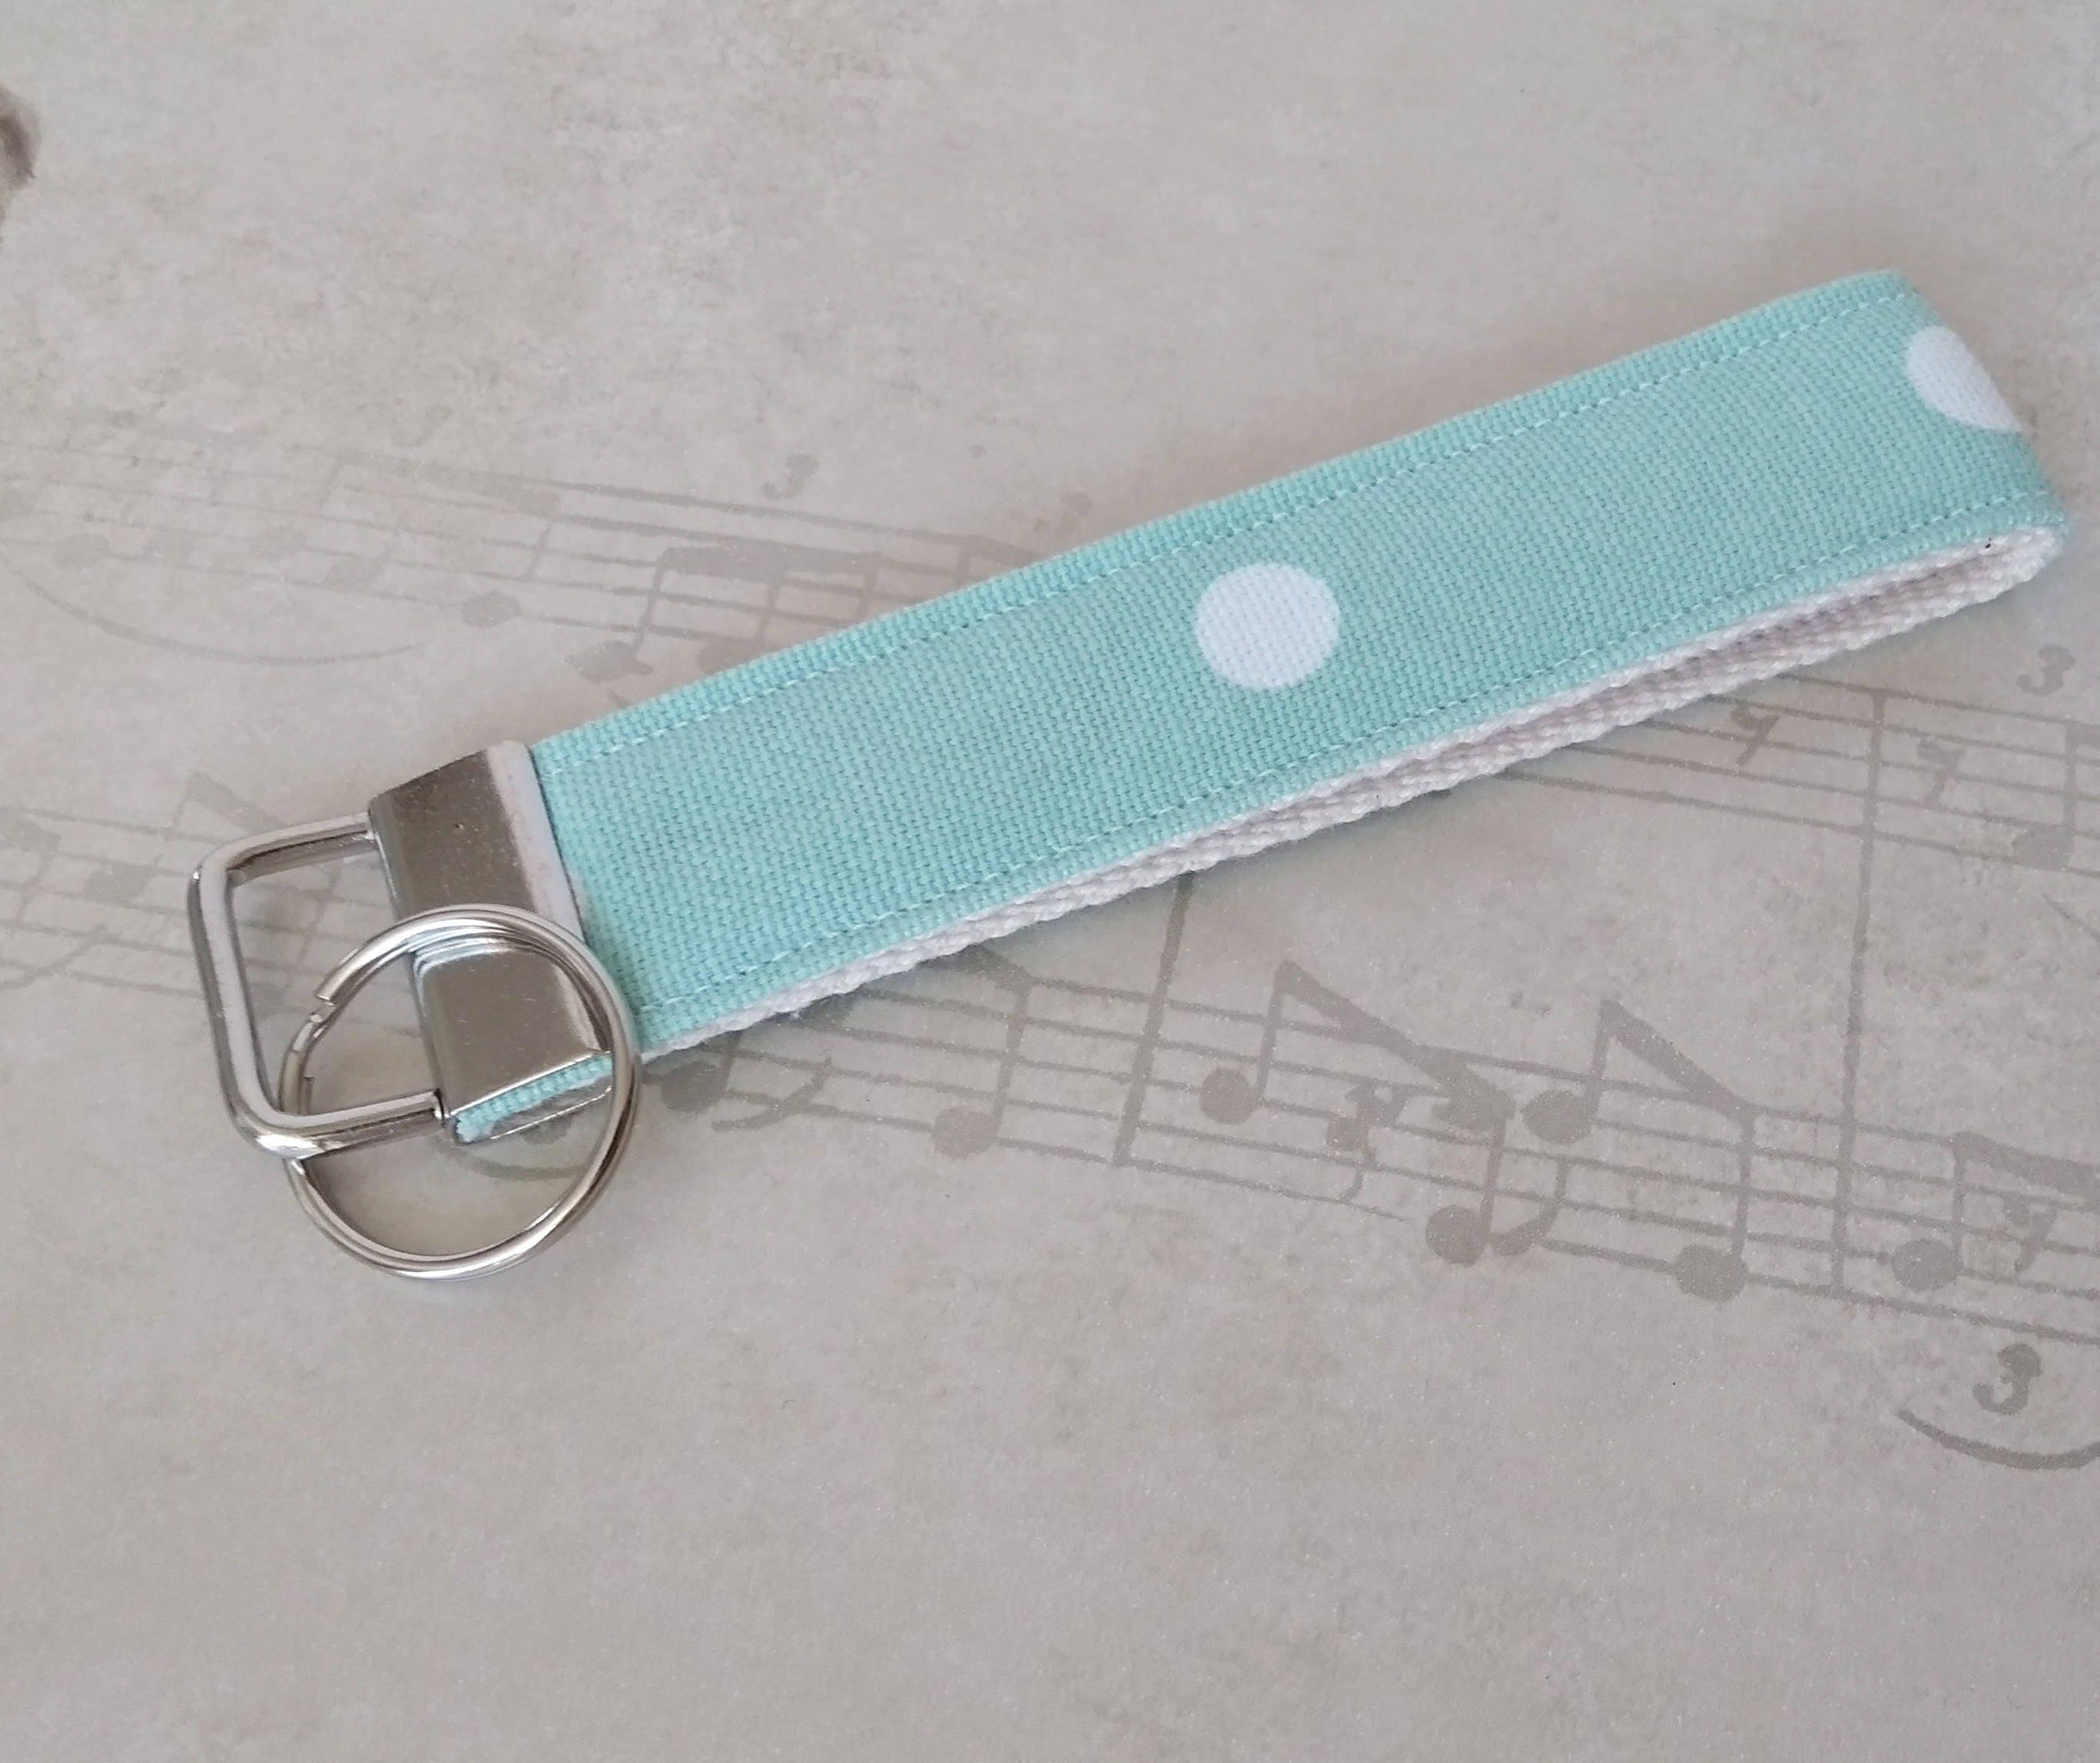 office key holder. Turquoise Wristlet Keyring - Sea Foam Wrist Strap Key Holder Marine Long Keychain Fabric Office